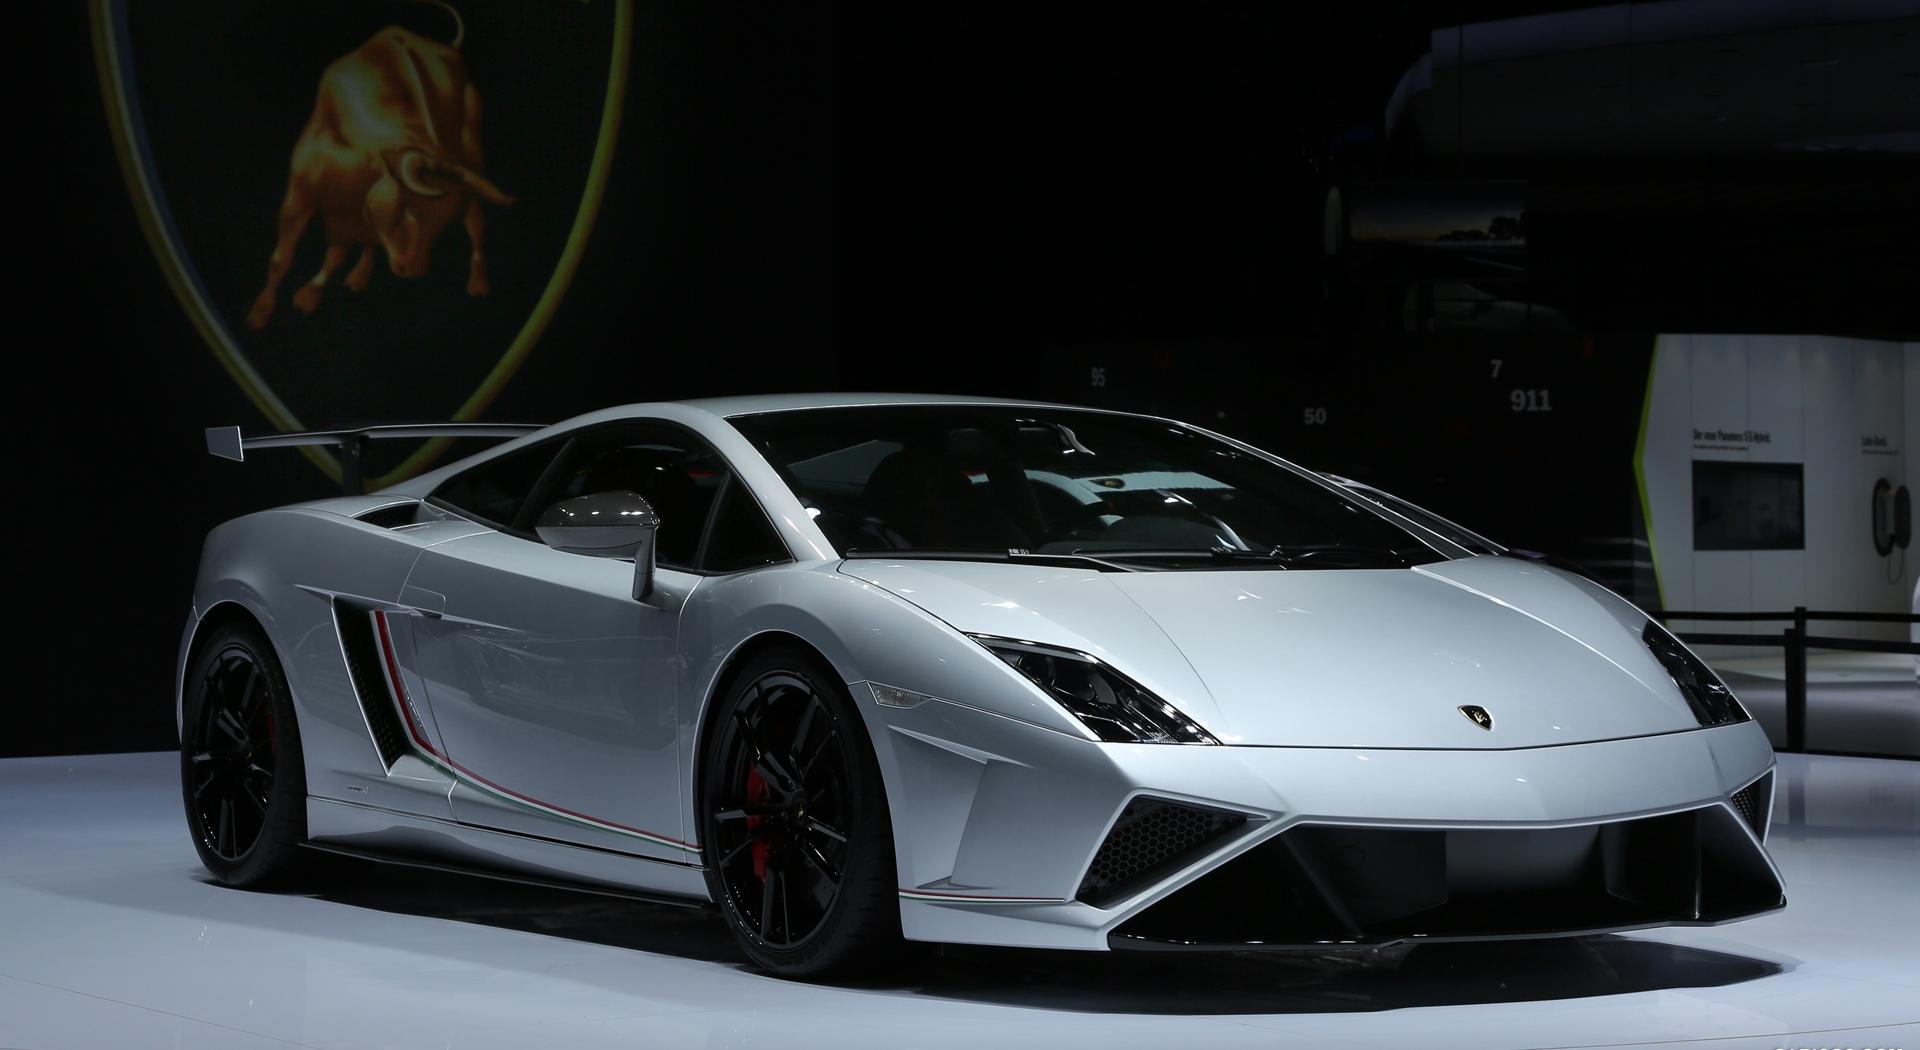 Name Live Wallpaper 3d Lamborghini Gallardo Pictures Hd Desktop Wallpapers 4k Hd